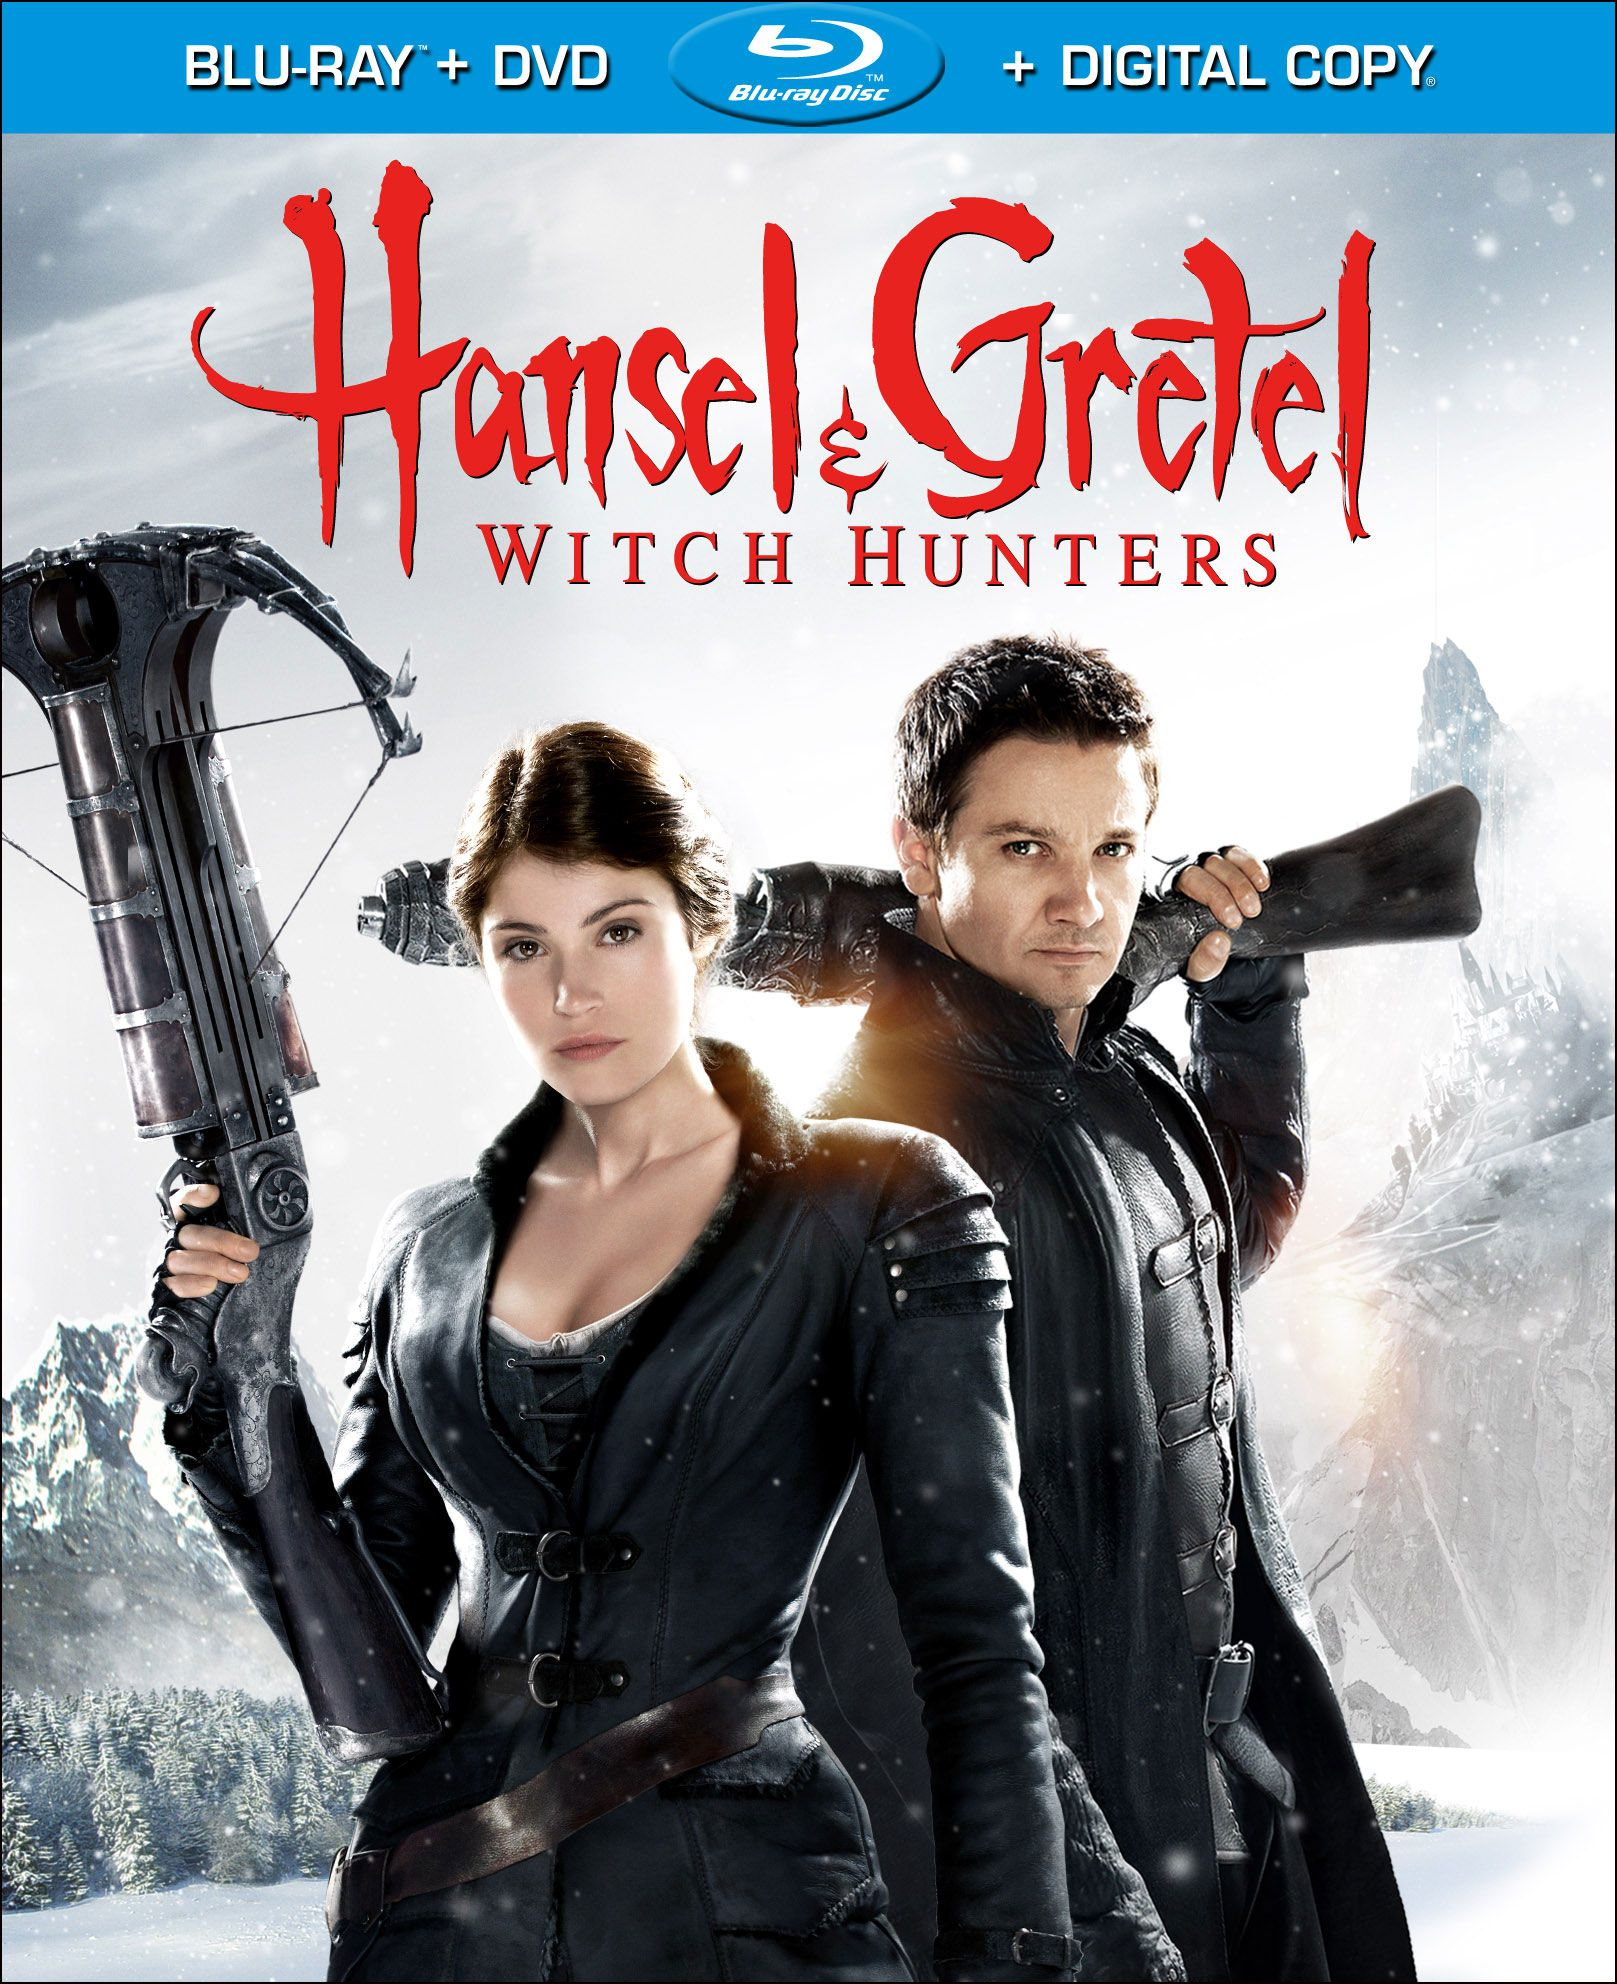 hansel and gretel english subtitle free download